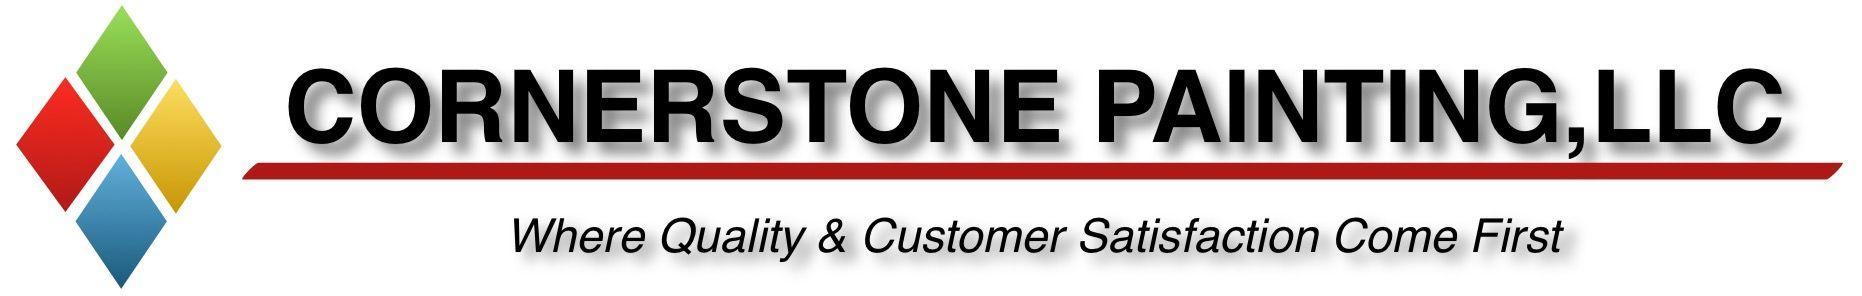 Cornerstone Painting LLC - Painters - 541 Huntsbridge Rd